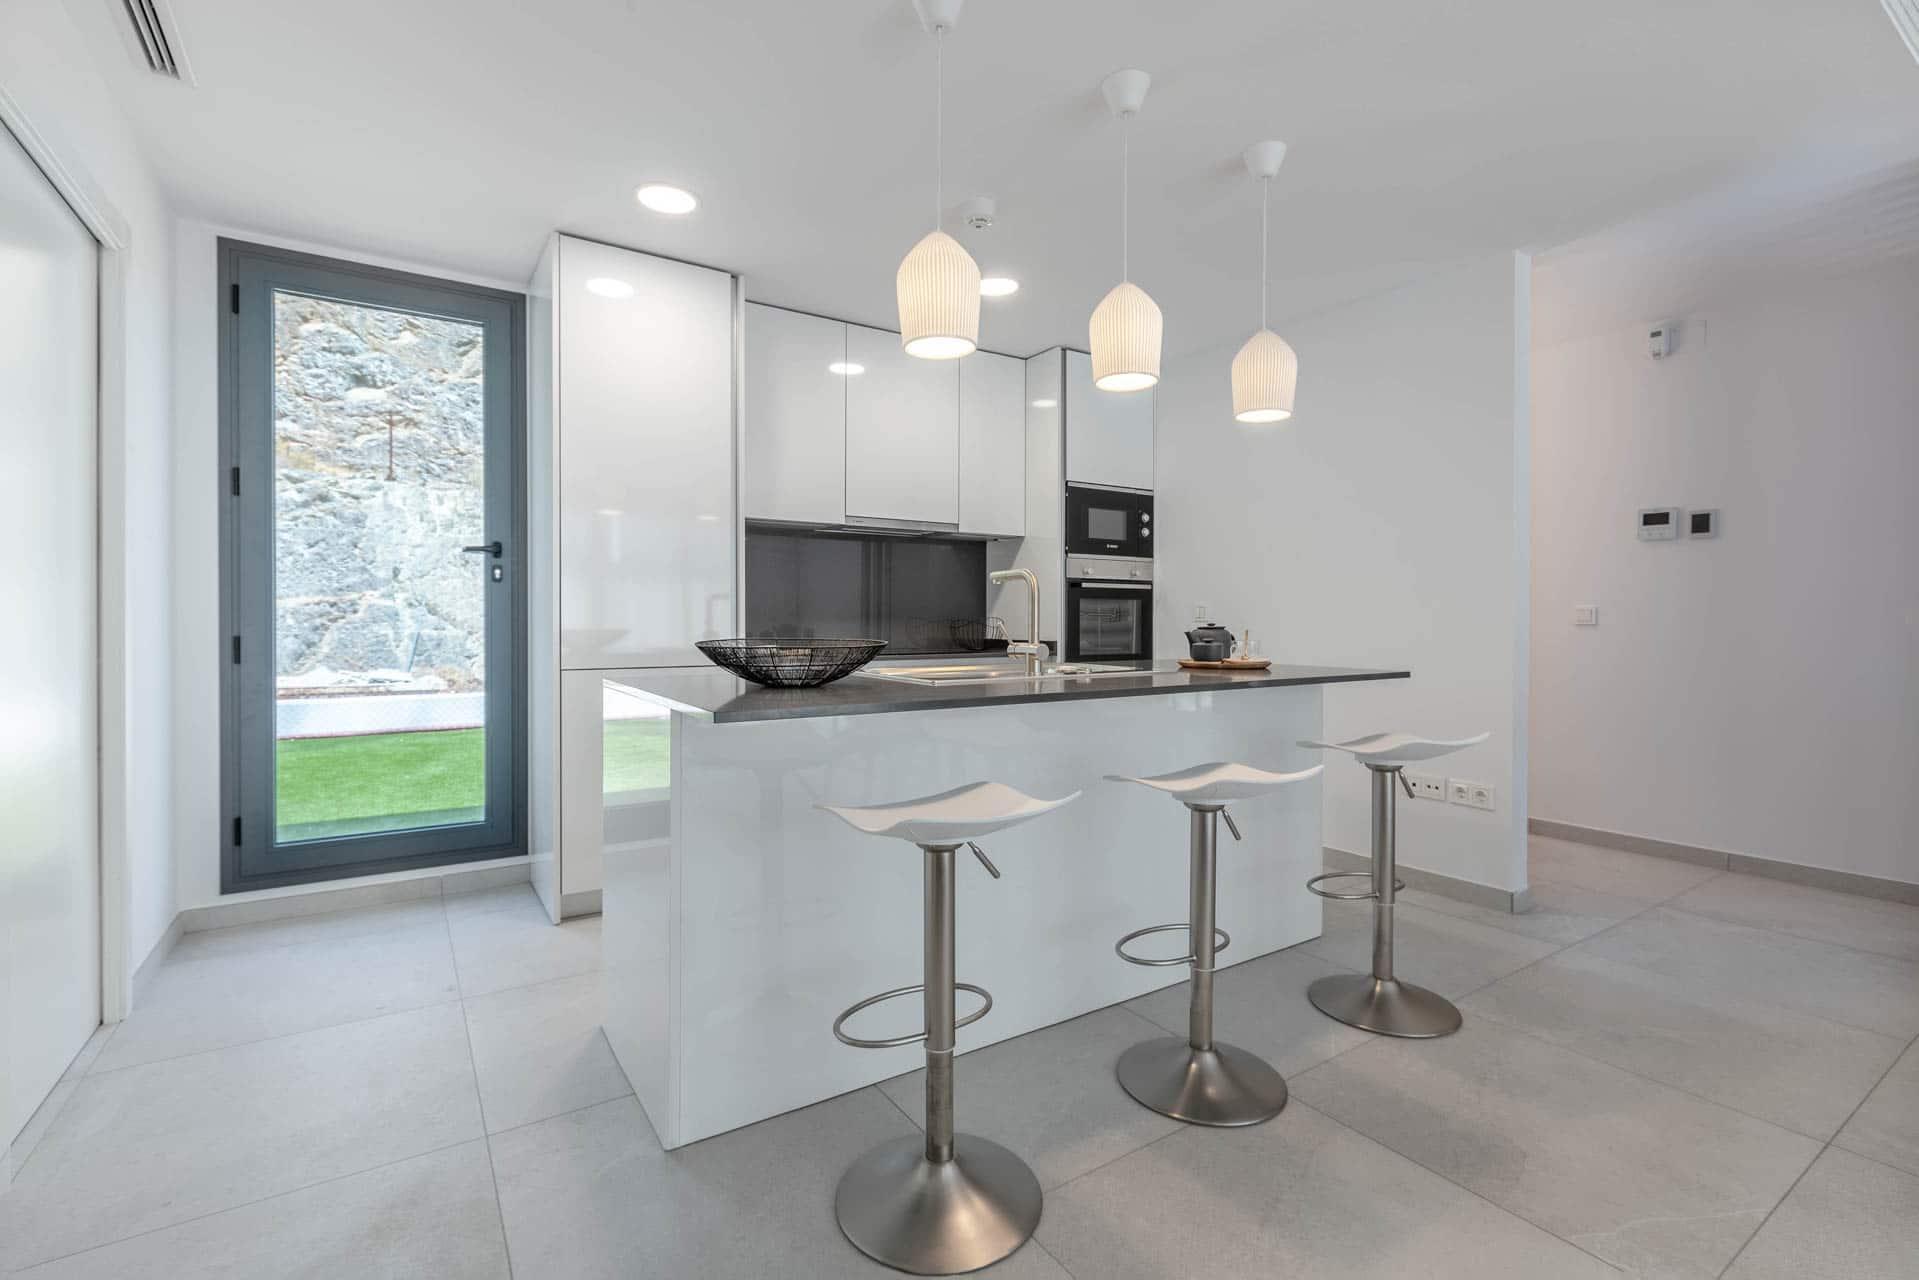 02 - Kitchen - Alborada Homes - Full Res